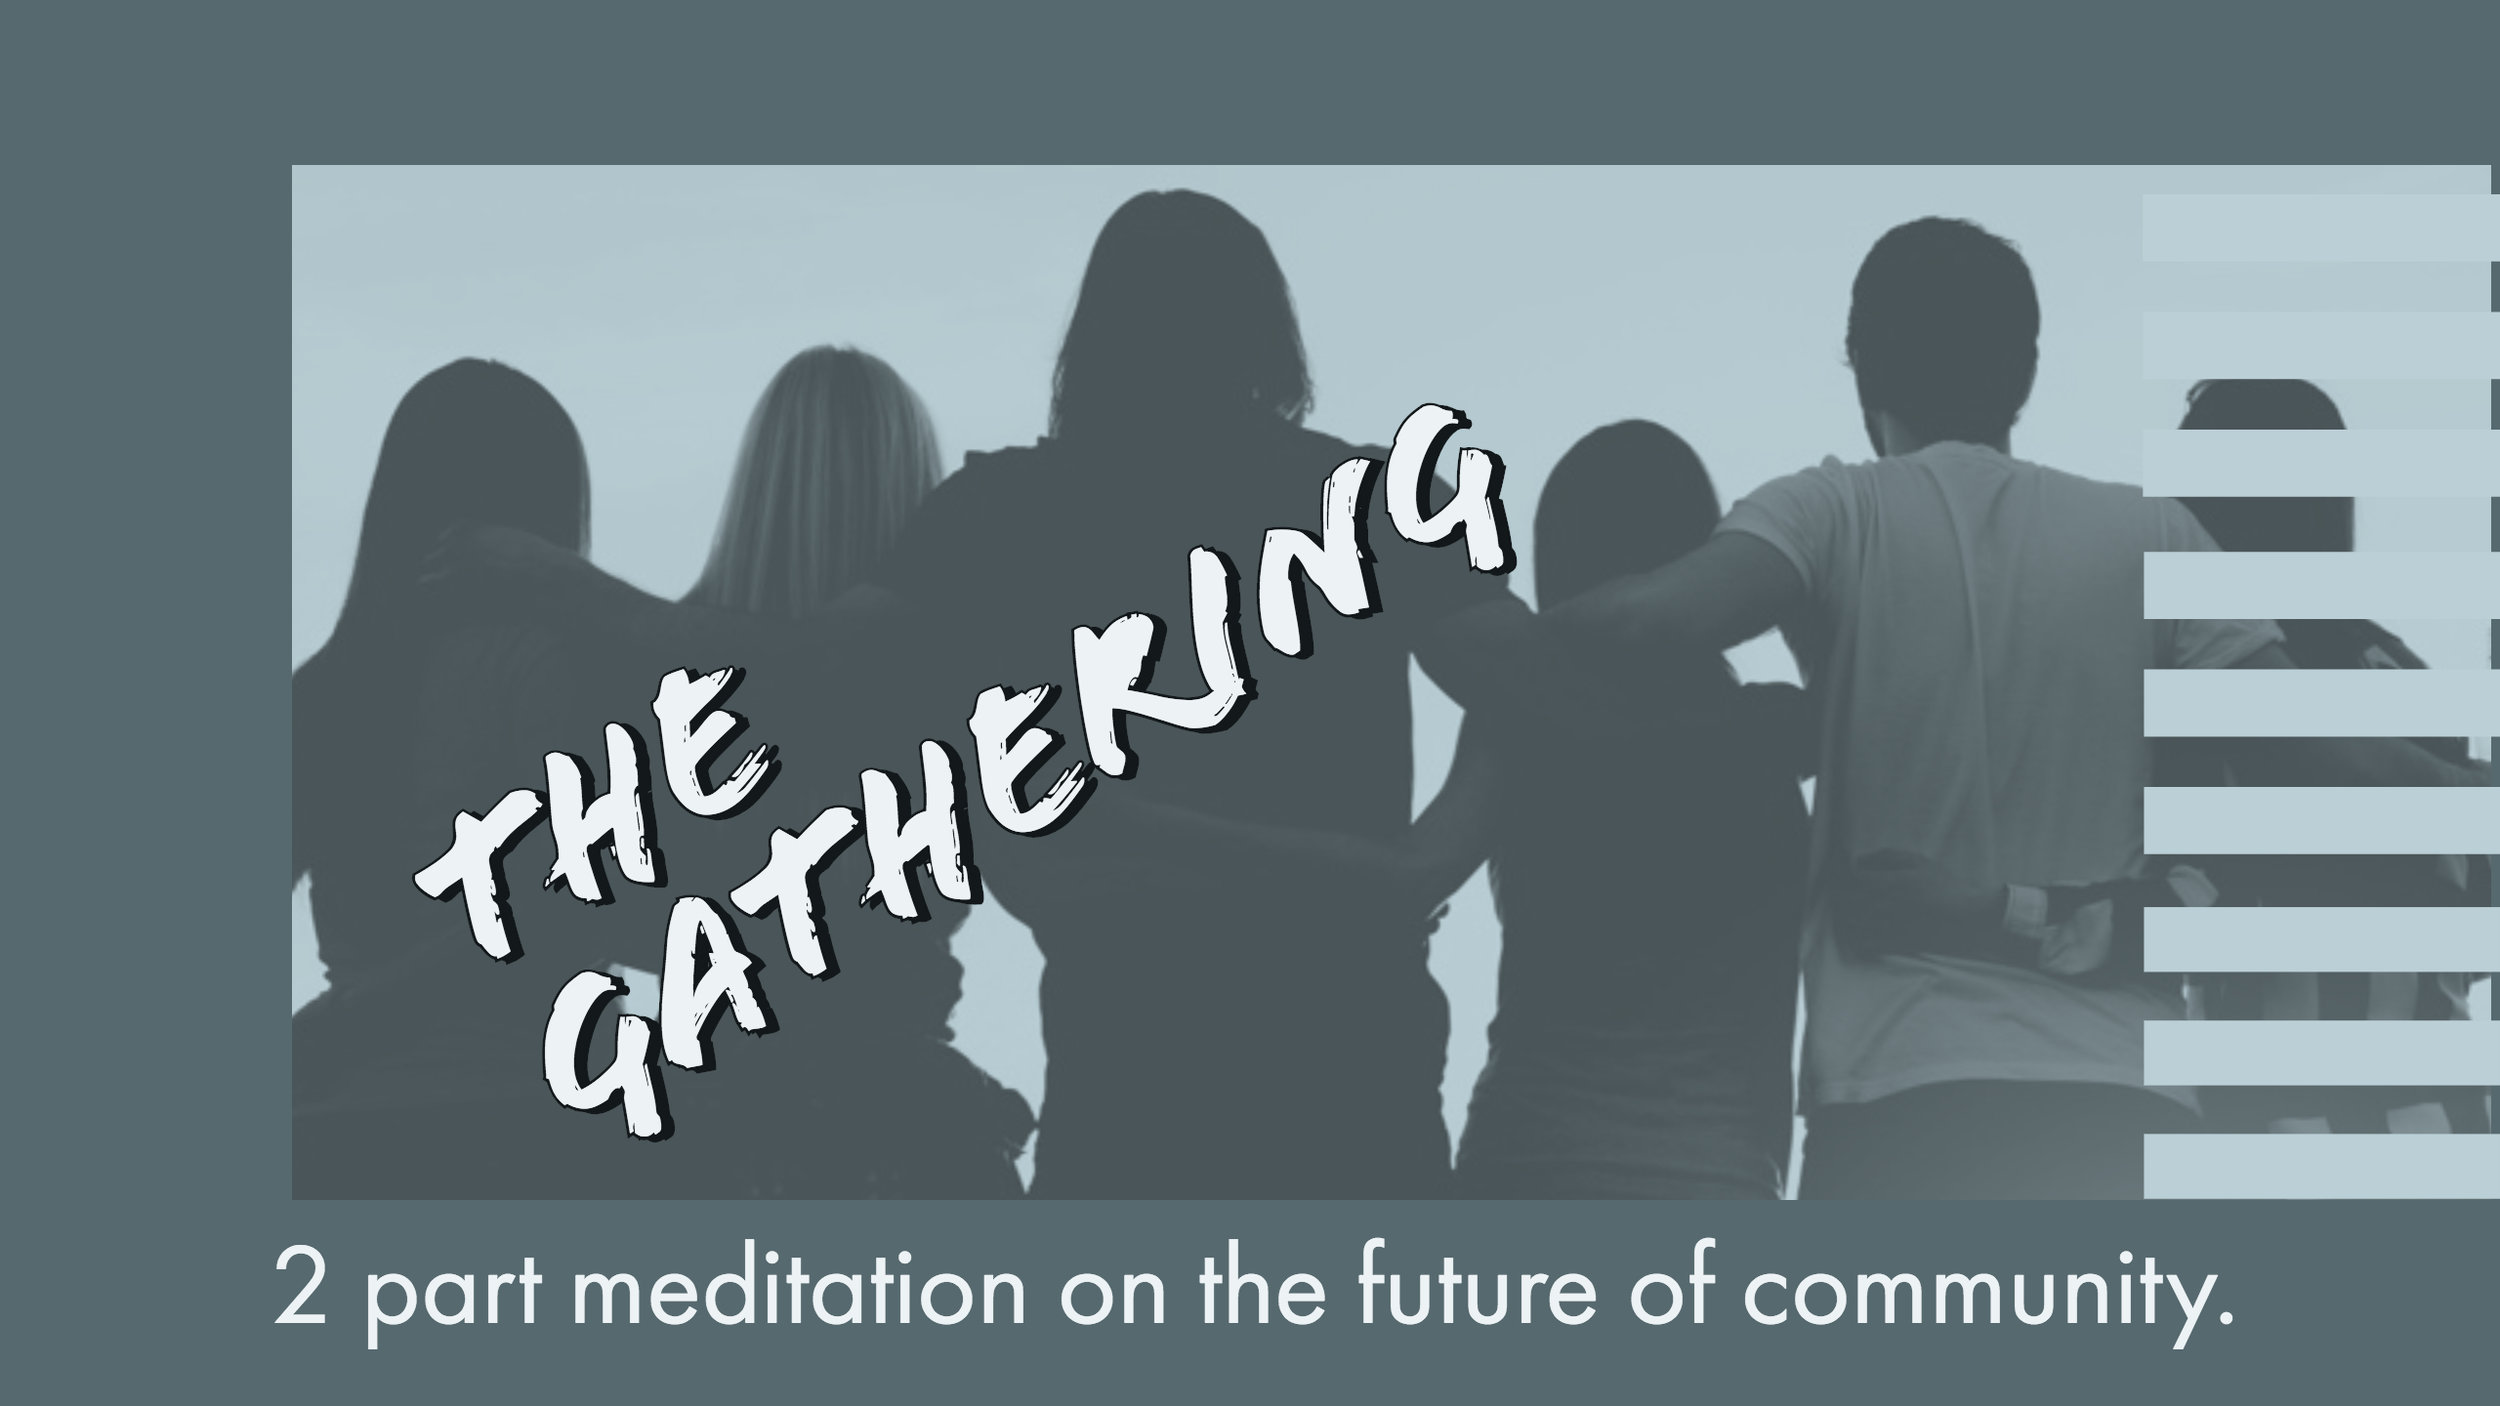 The Gathering Pt 2 - Robert Frazier